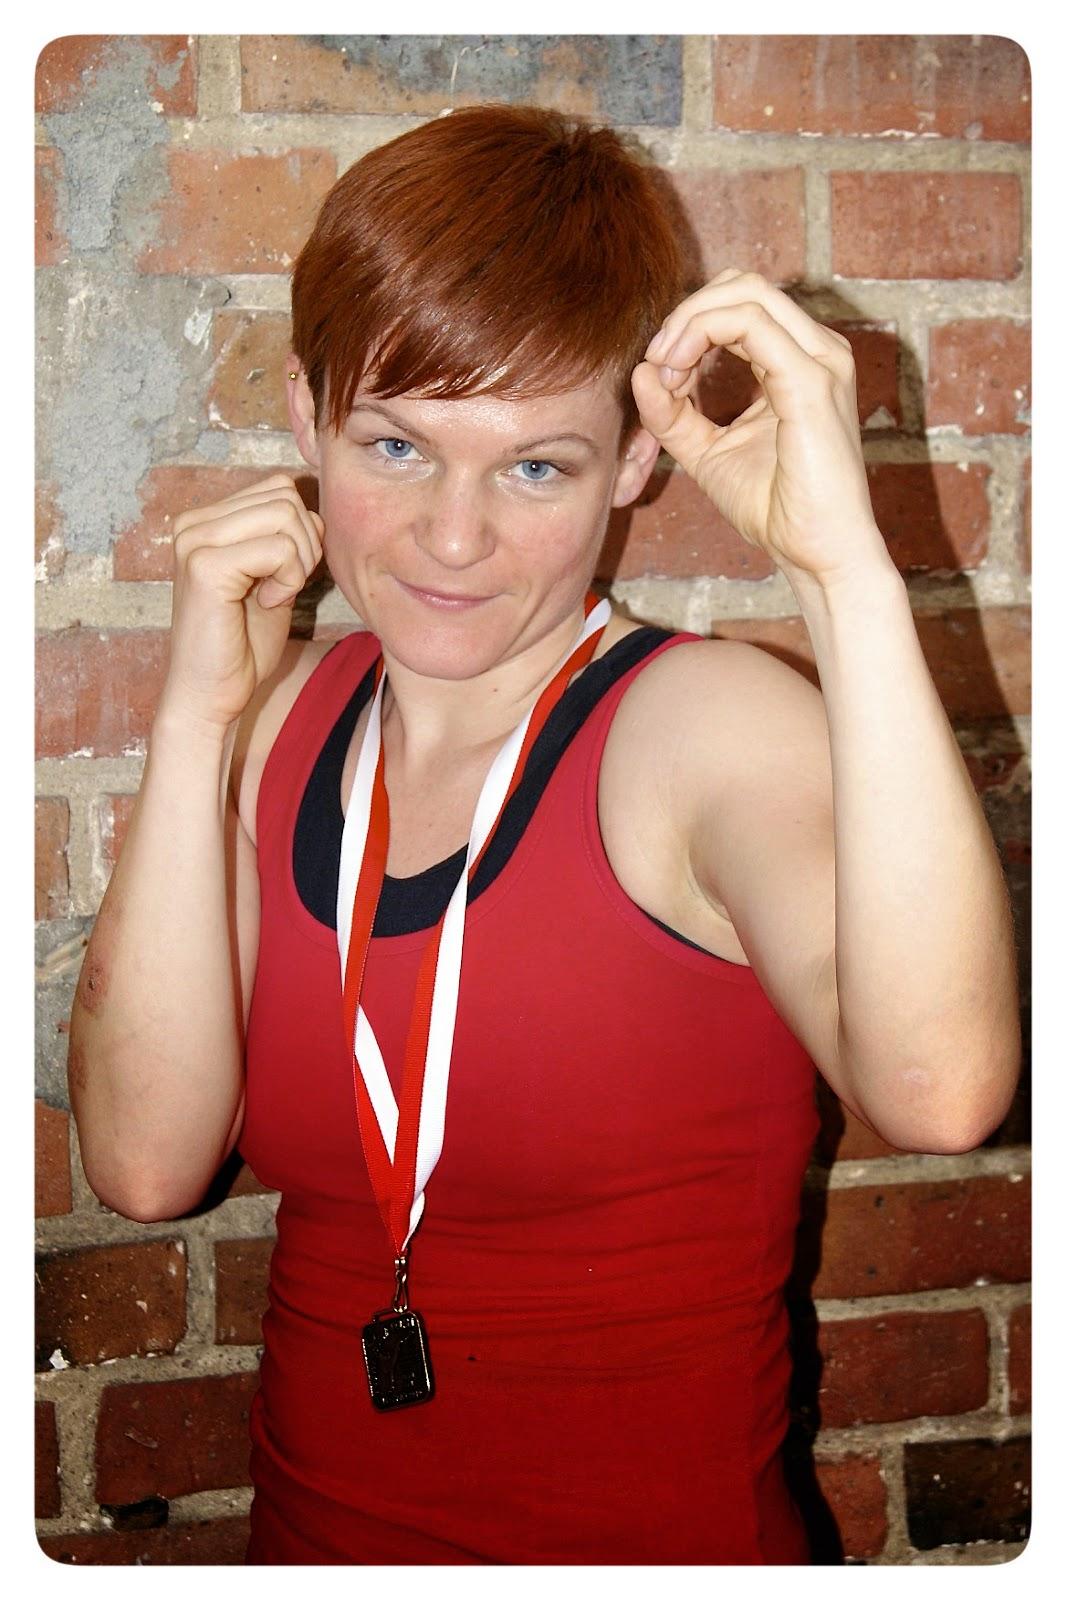 Ewa Boś, kickboxing, trening, Zielona Góra, sport, Nowa Sól, K-1, Insbruck, Austian Clasicc